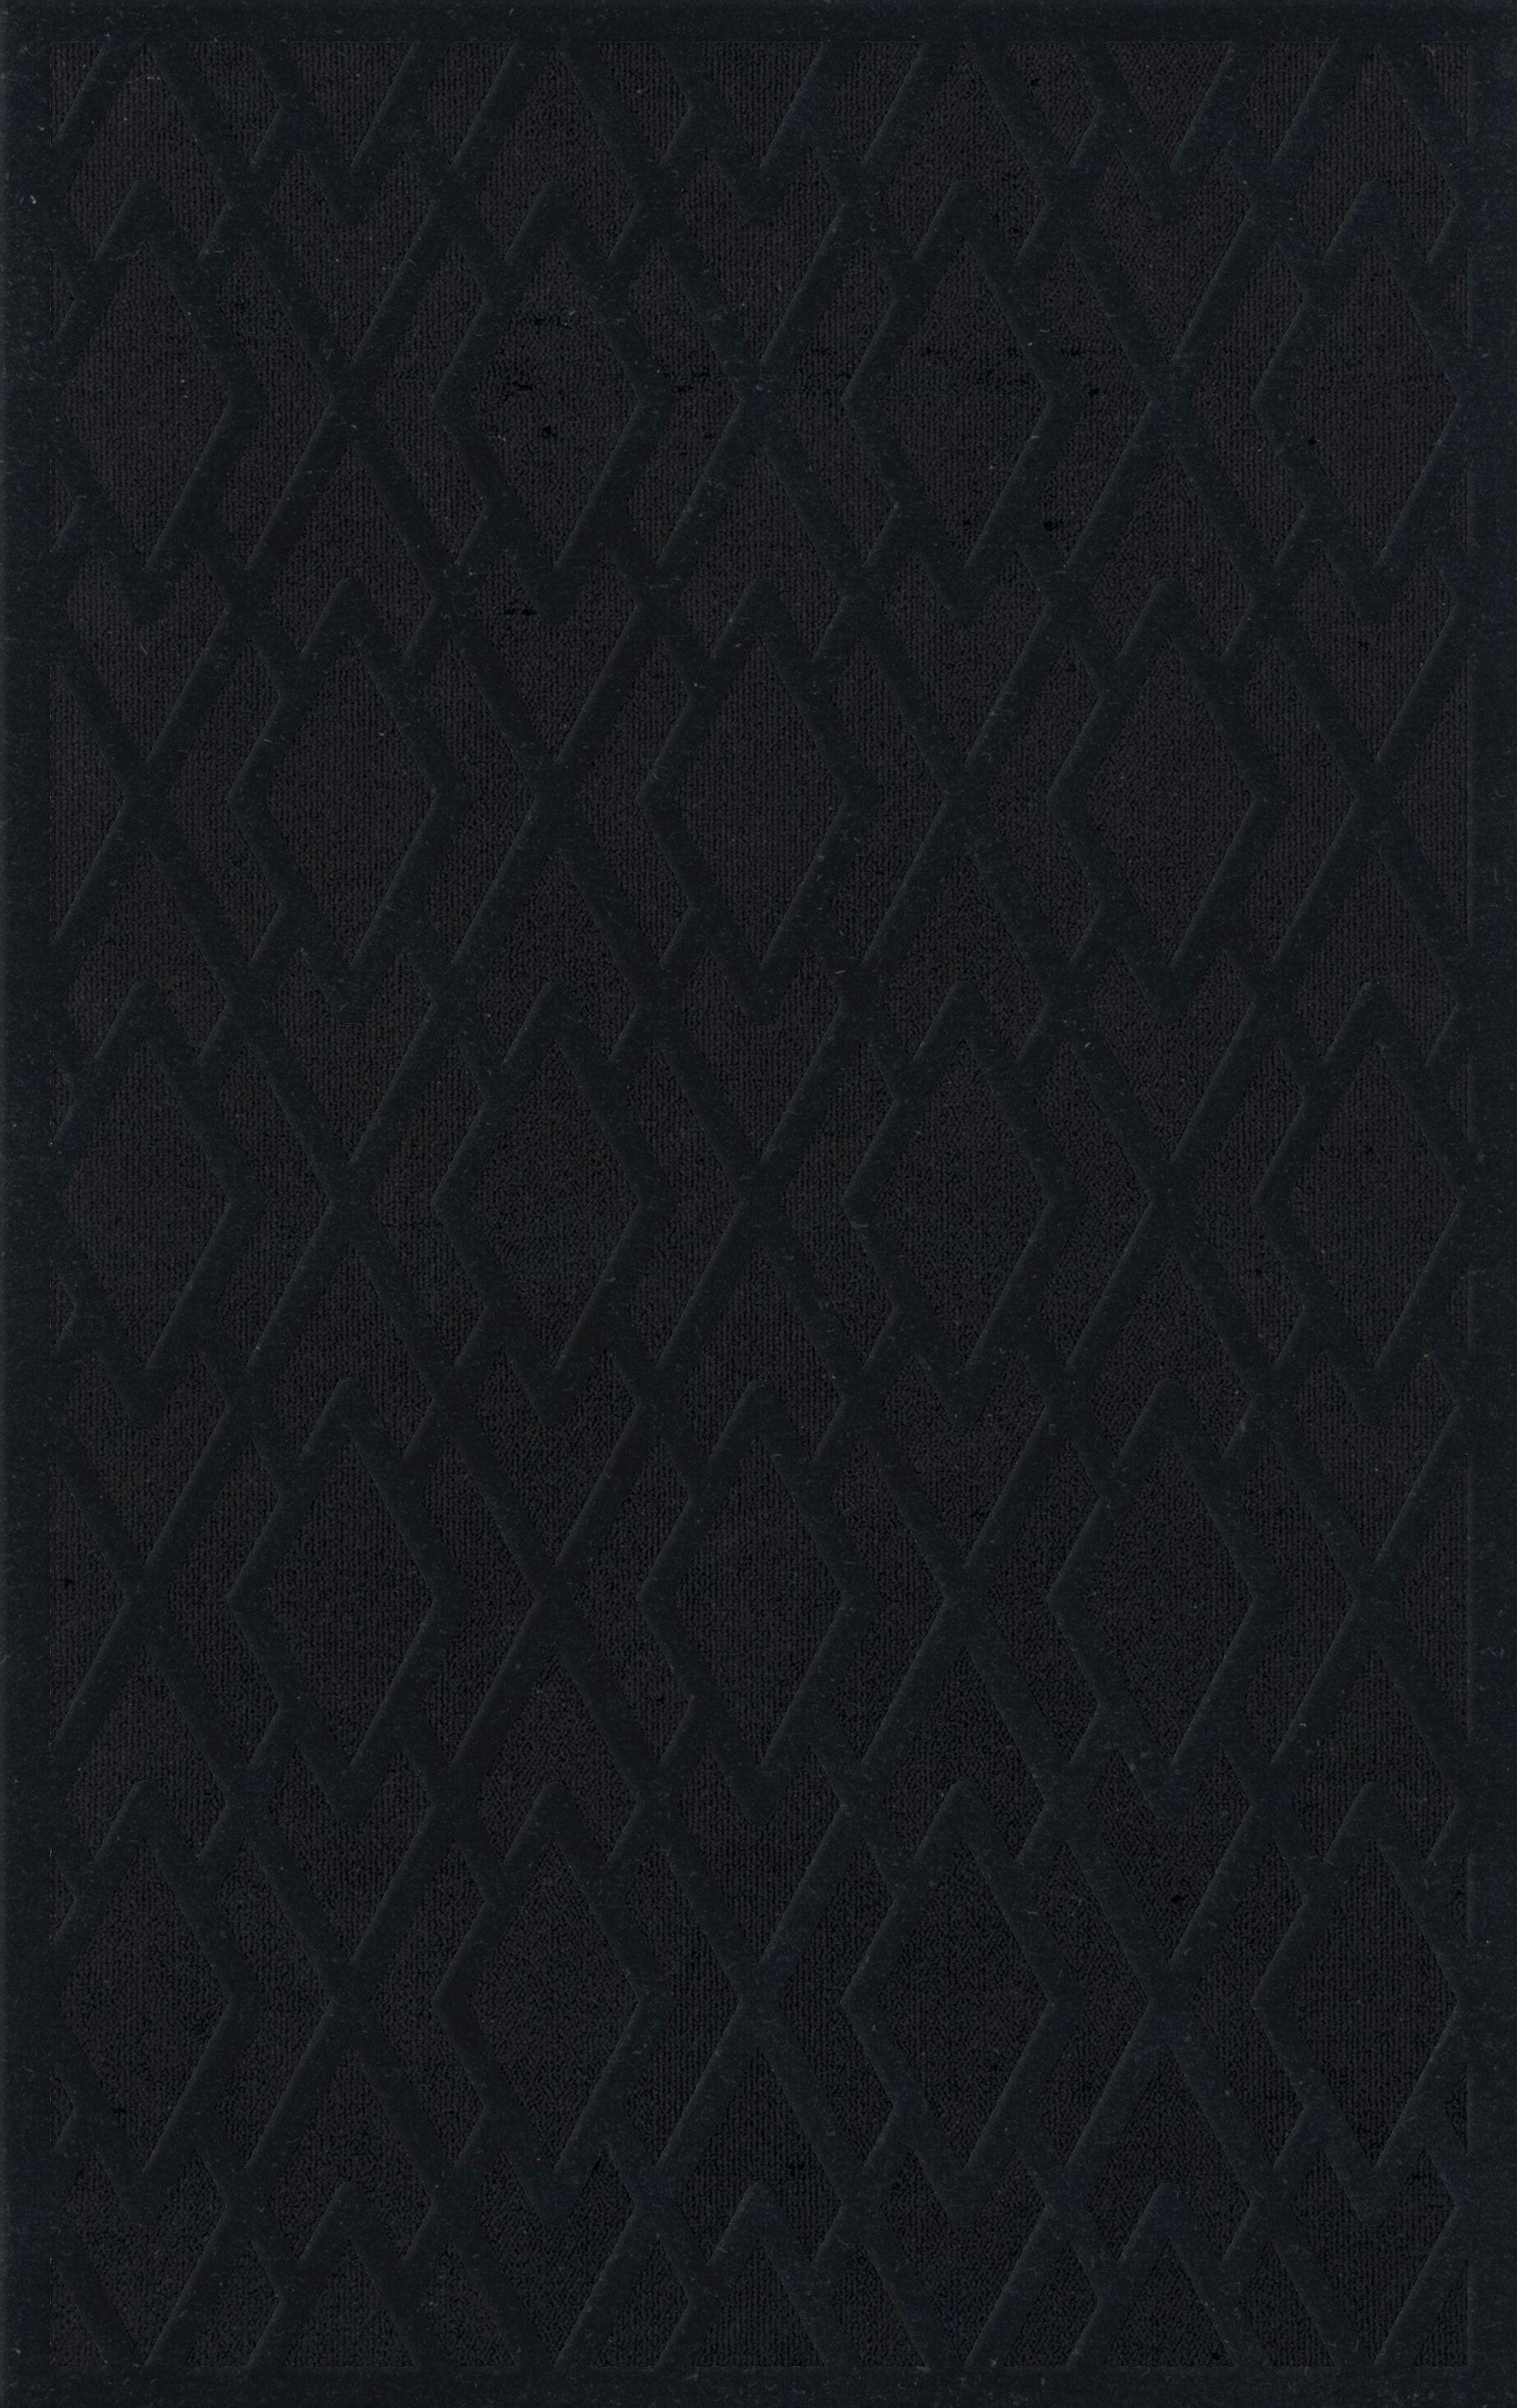 Dover Black Area Rug Rug Size: Rectangle 5' x 8'